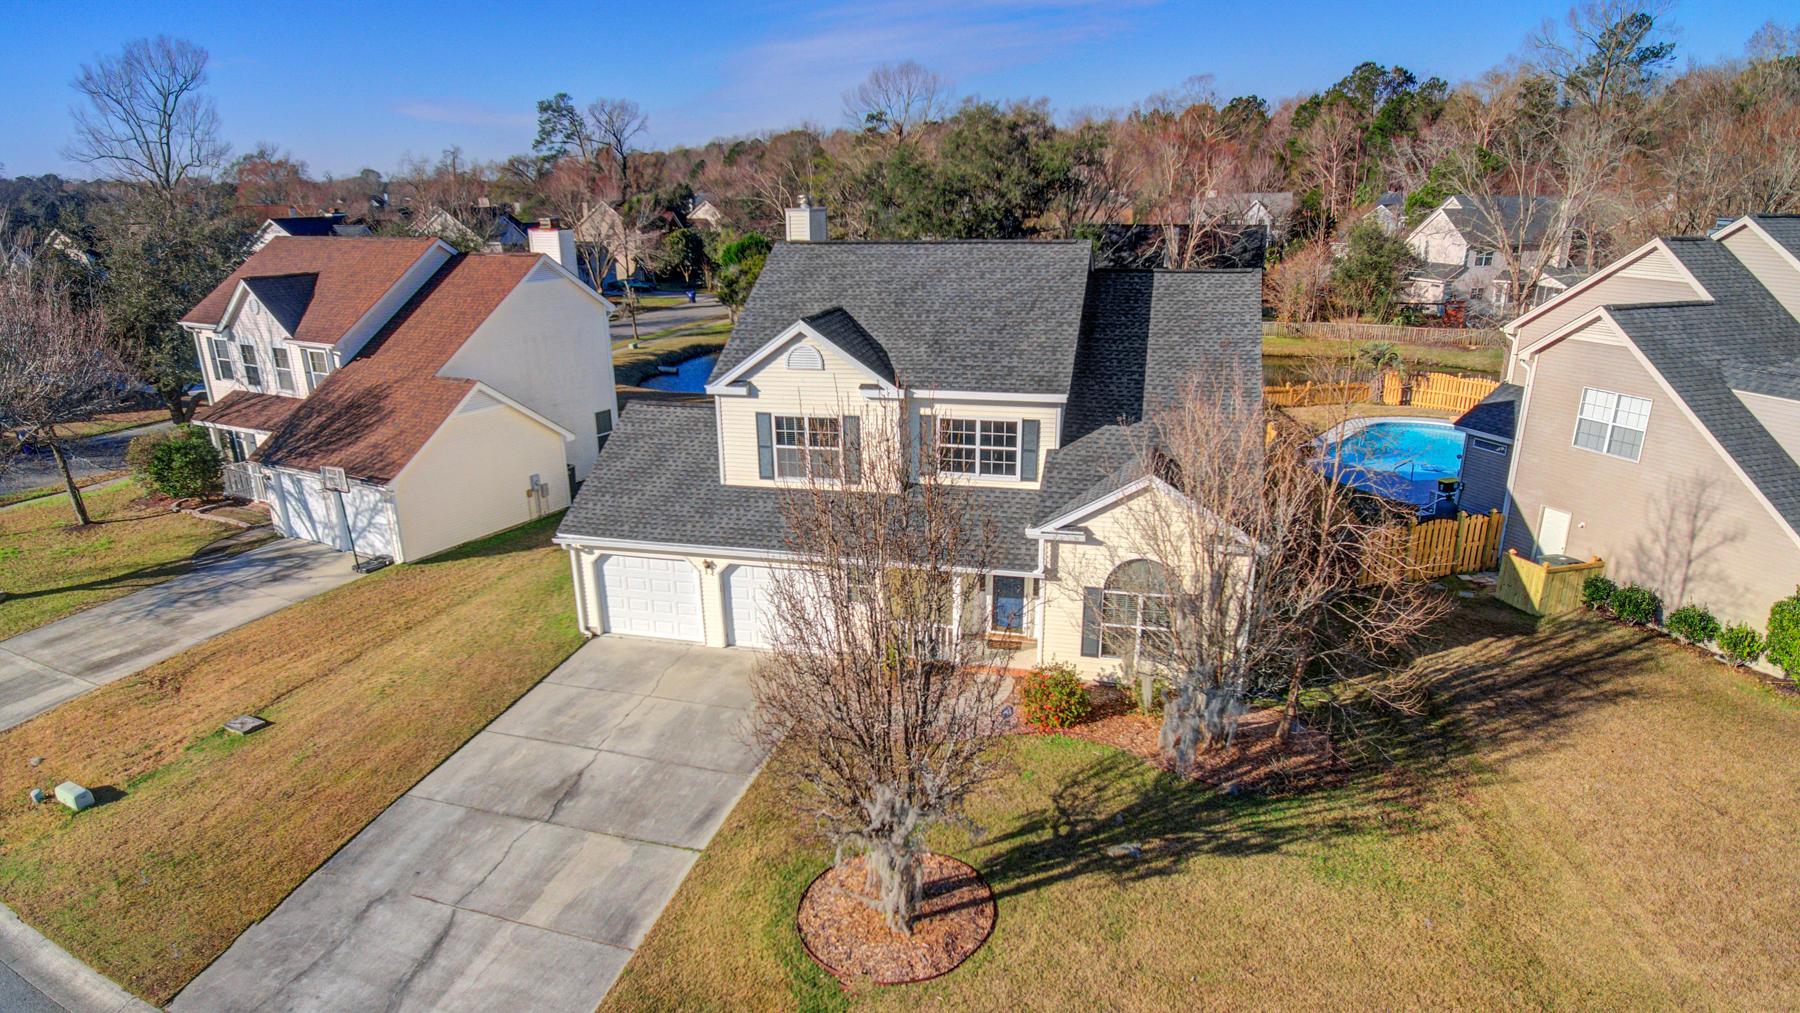 Village Green Homes For Sale - 3323 Hearthside, Charleston, SC - 28